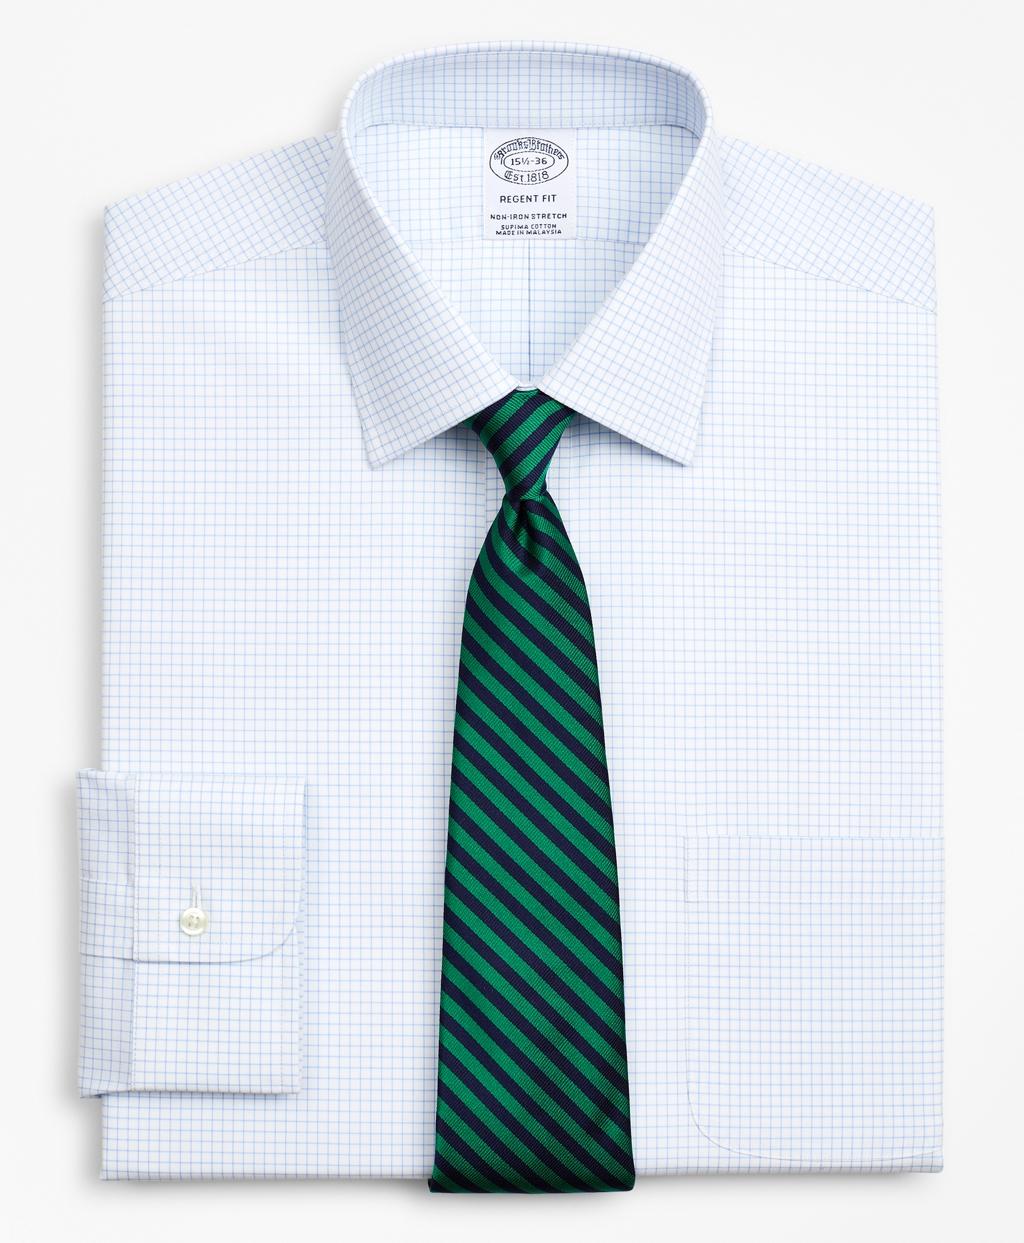 Brooksbrothers Stretch Regent Regular-Fit Dress Shirt, Non-Iron Poplin Ainsley Collar Small Grid Check